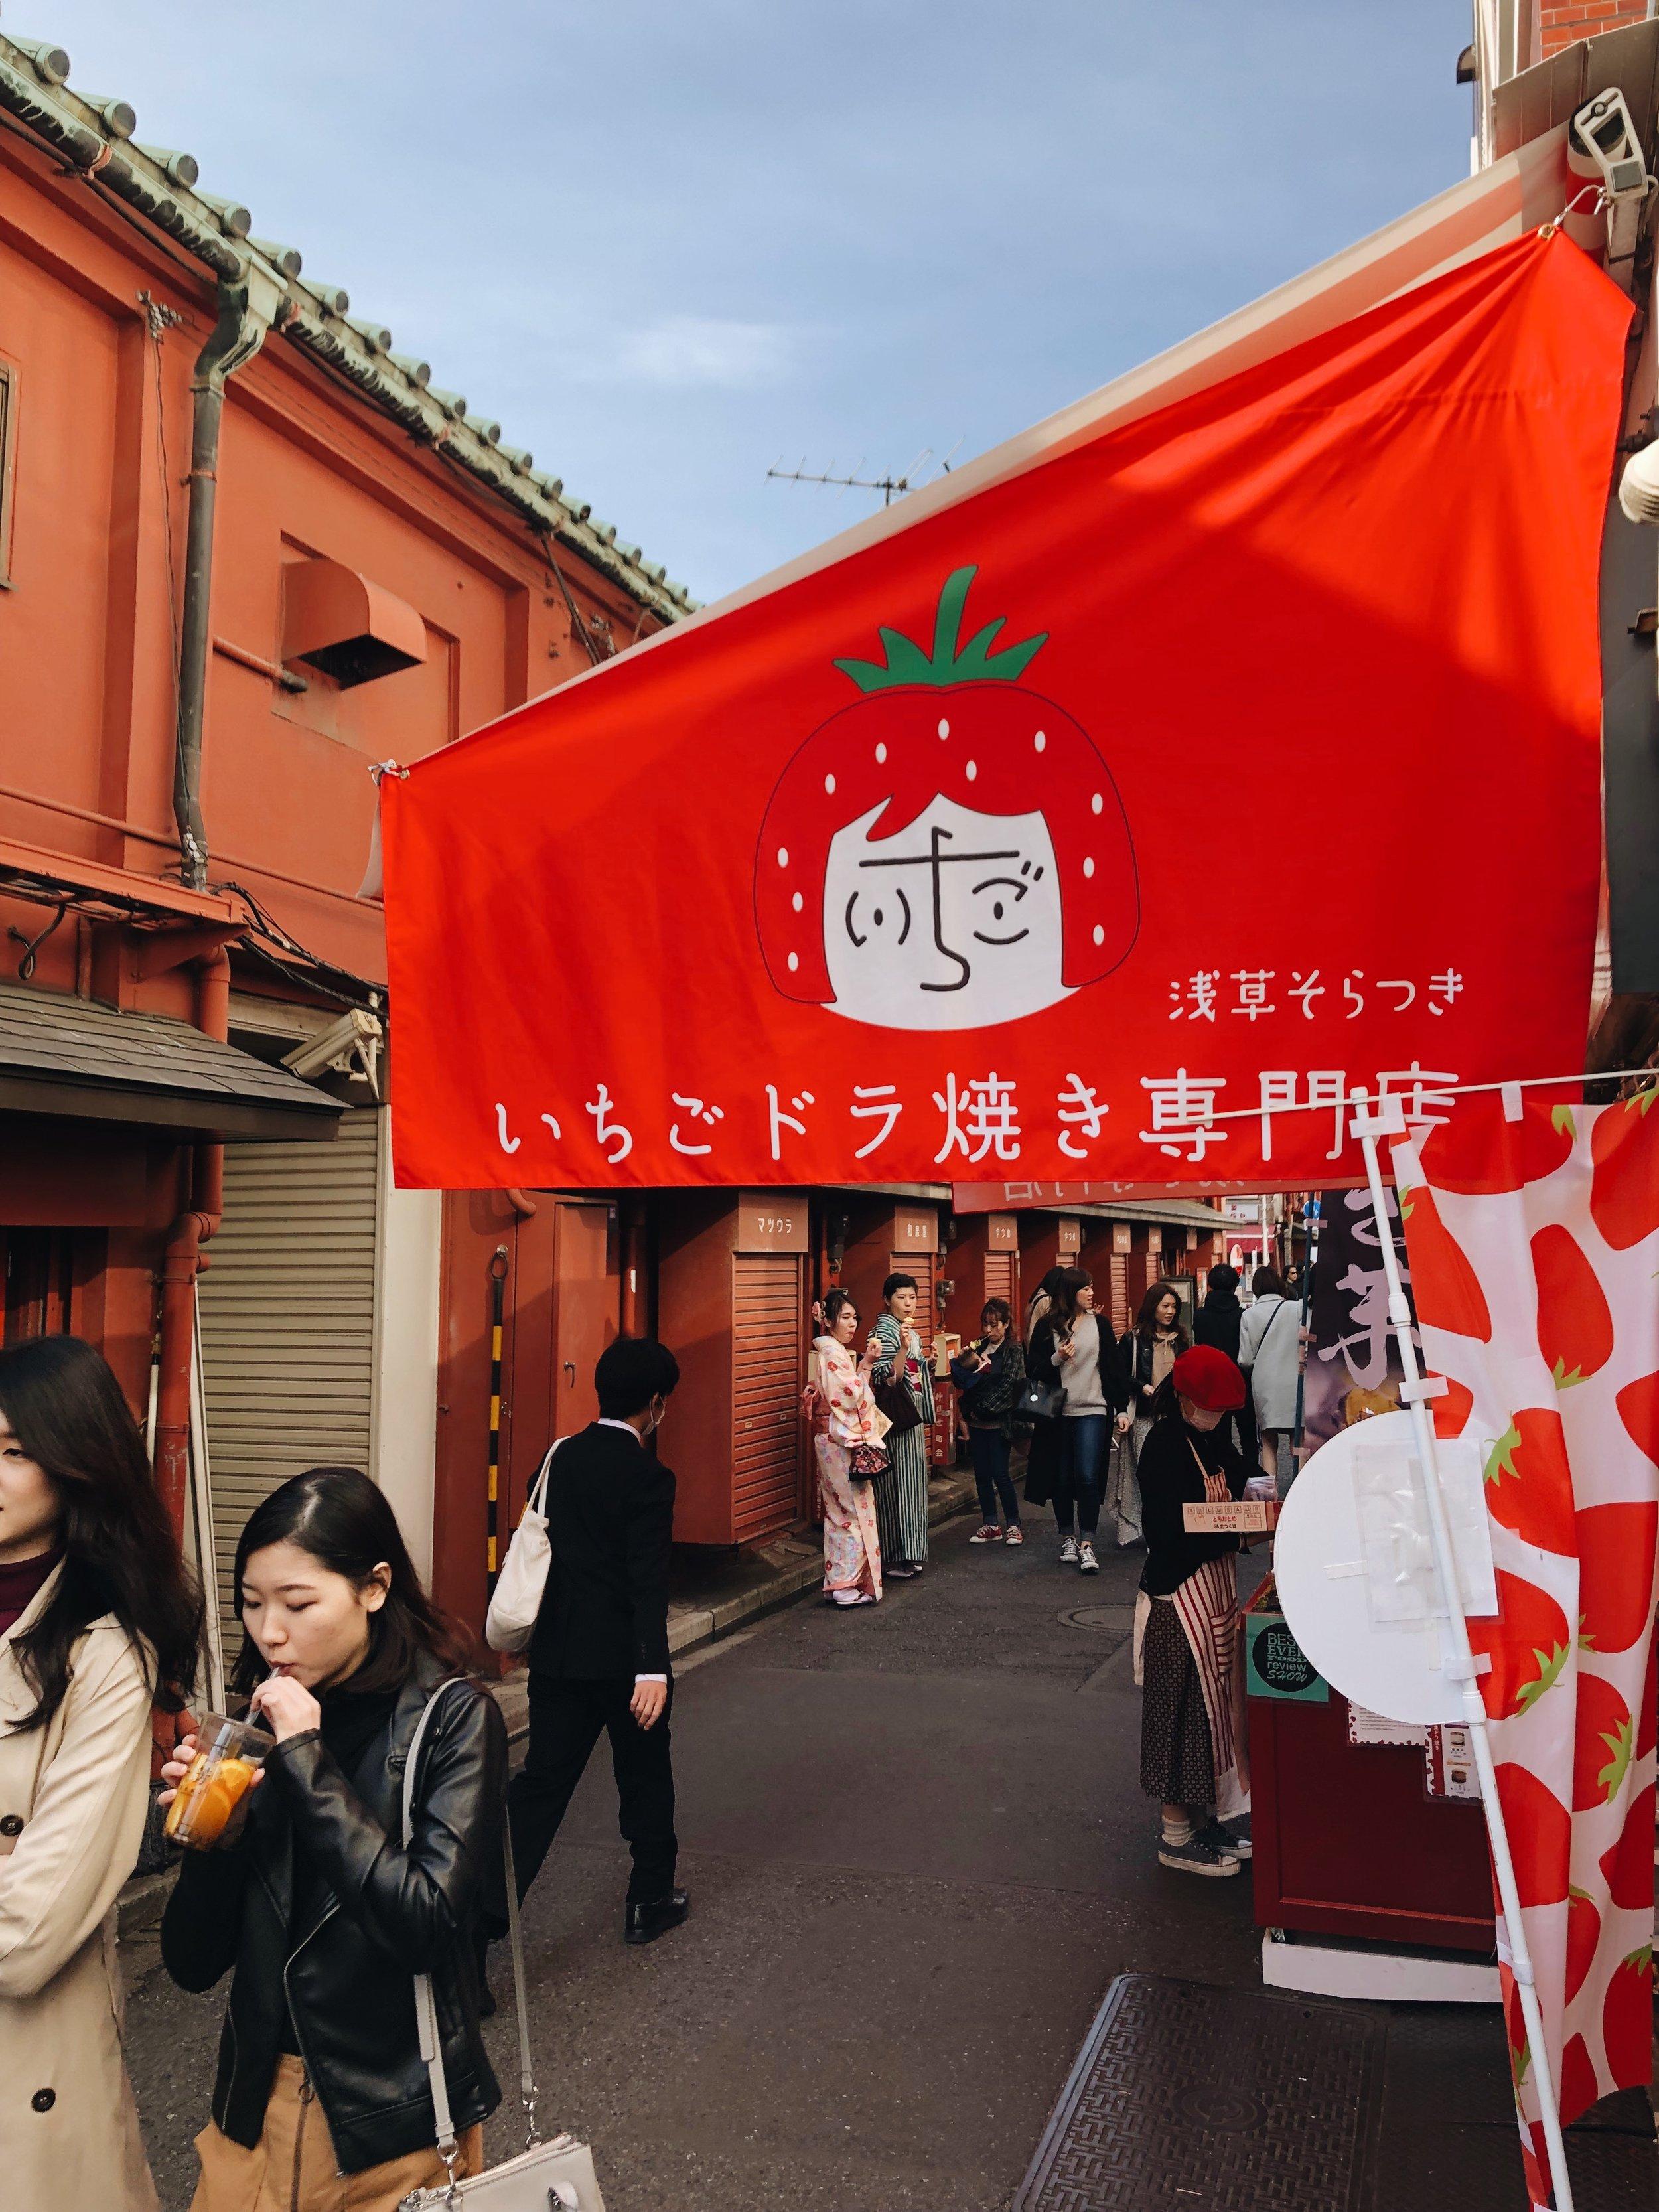 Strawberry vendor at Asakusa.